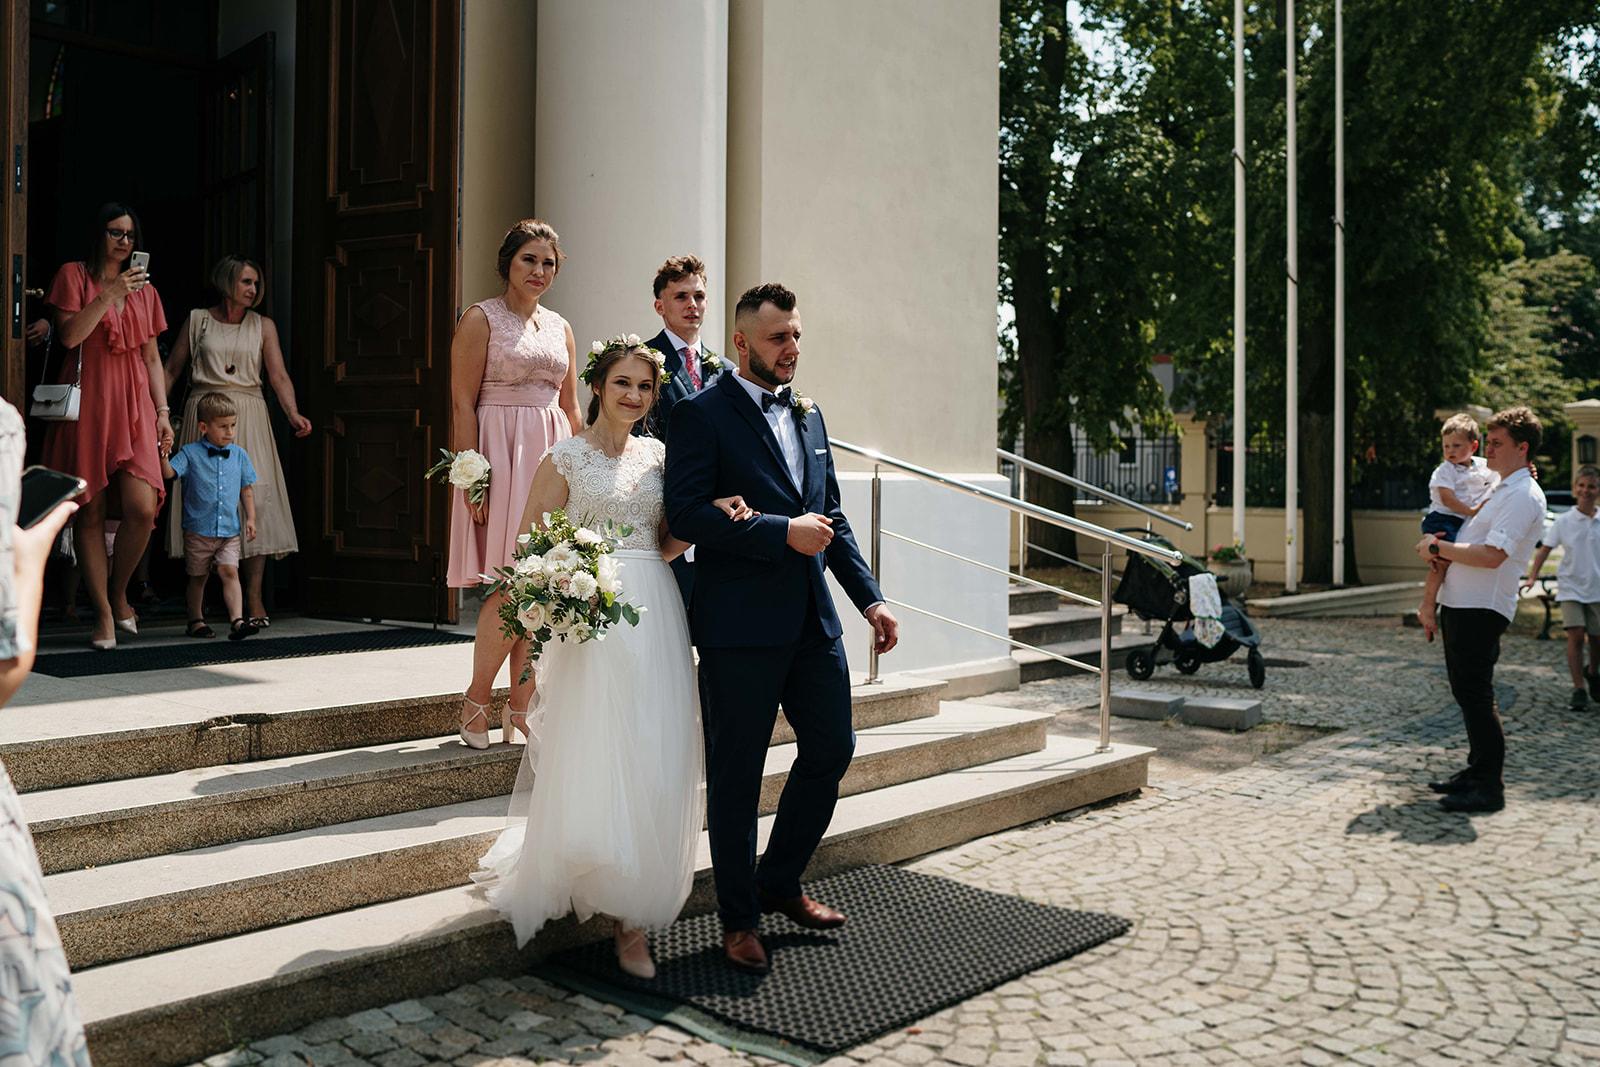 CHATA BARBECUE Otrębusy - Magda i Rafał